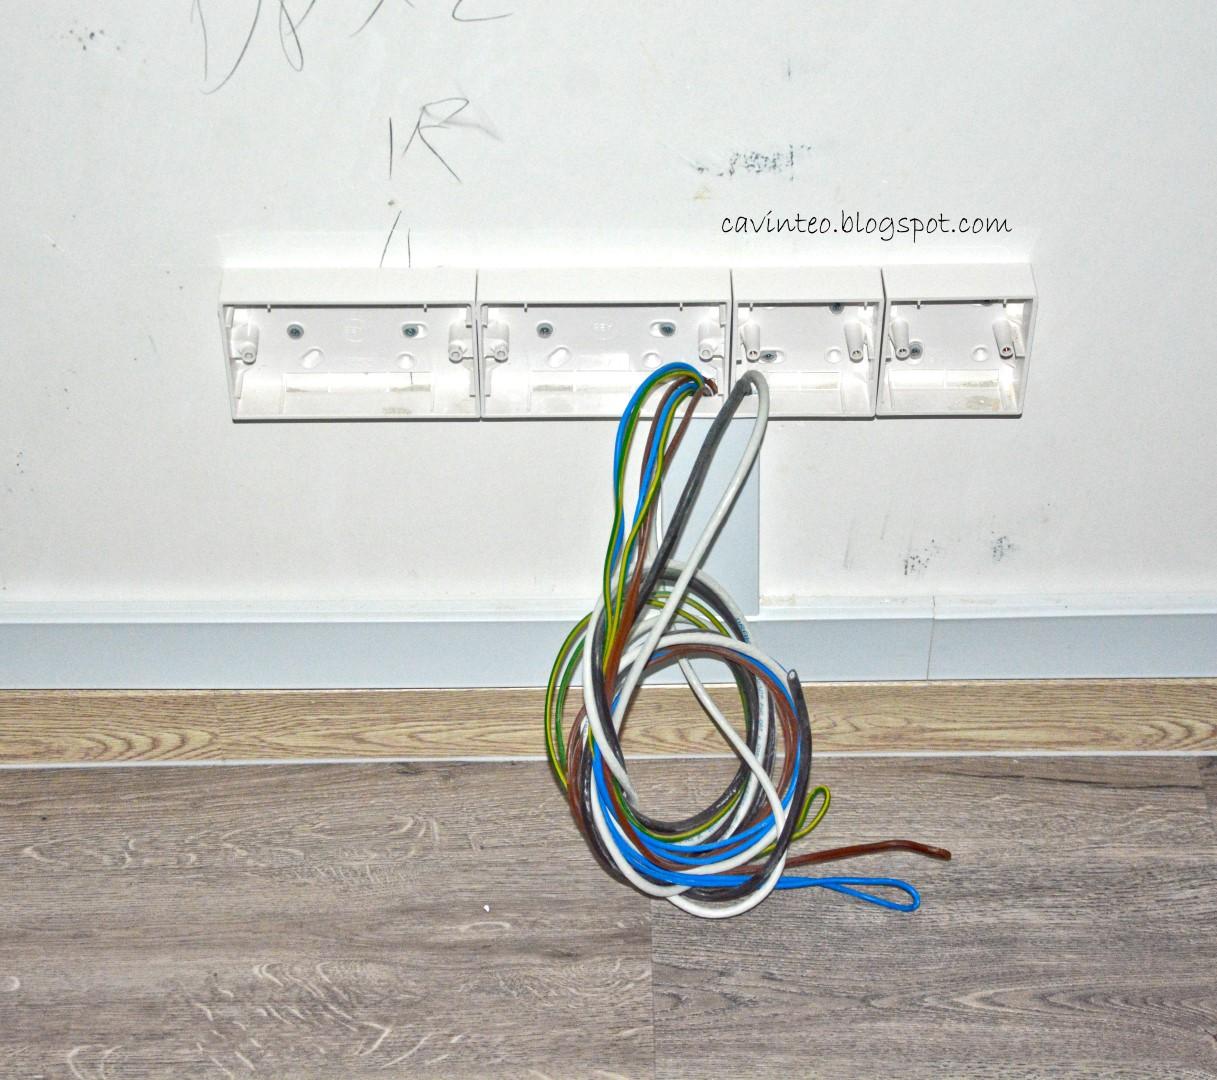 Entree Kibbles: Renovation Part 2 - Flooring & Preparation for ...